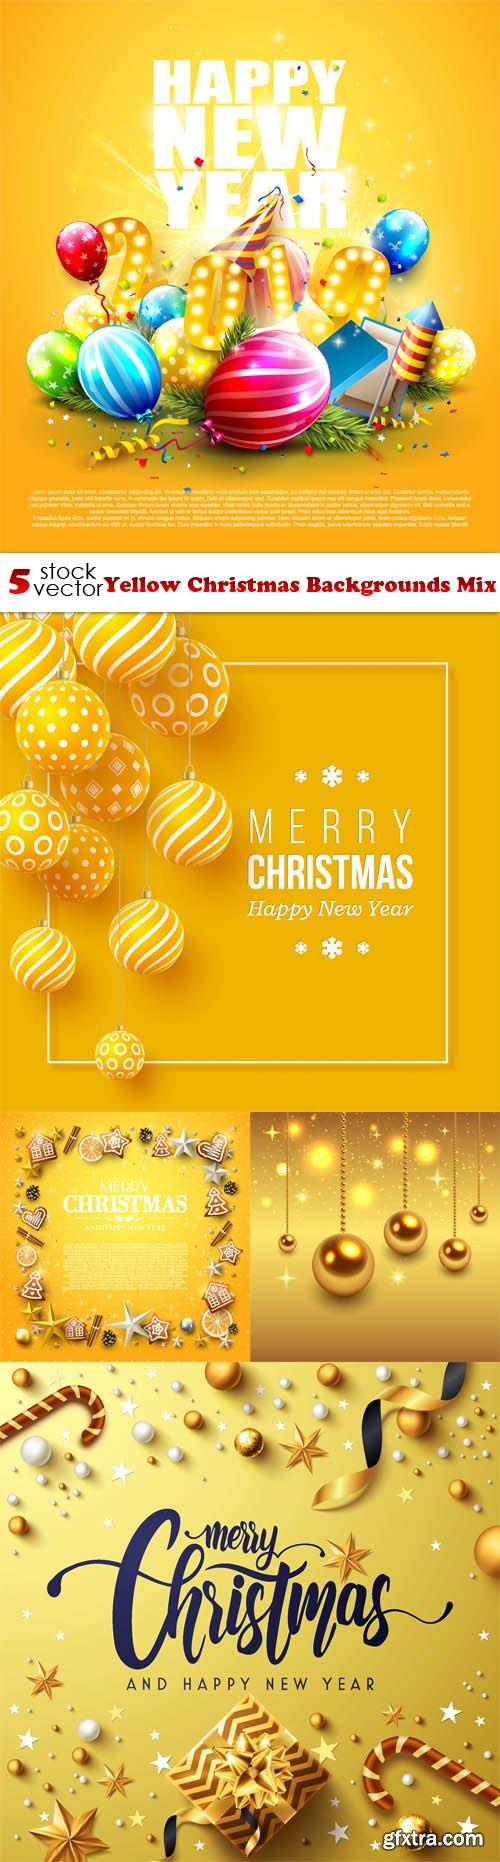 Vectors - Yellow Christmas Backgrounds Mix